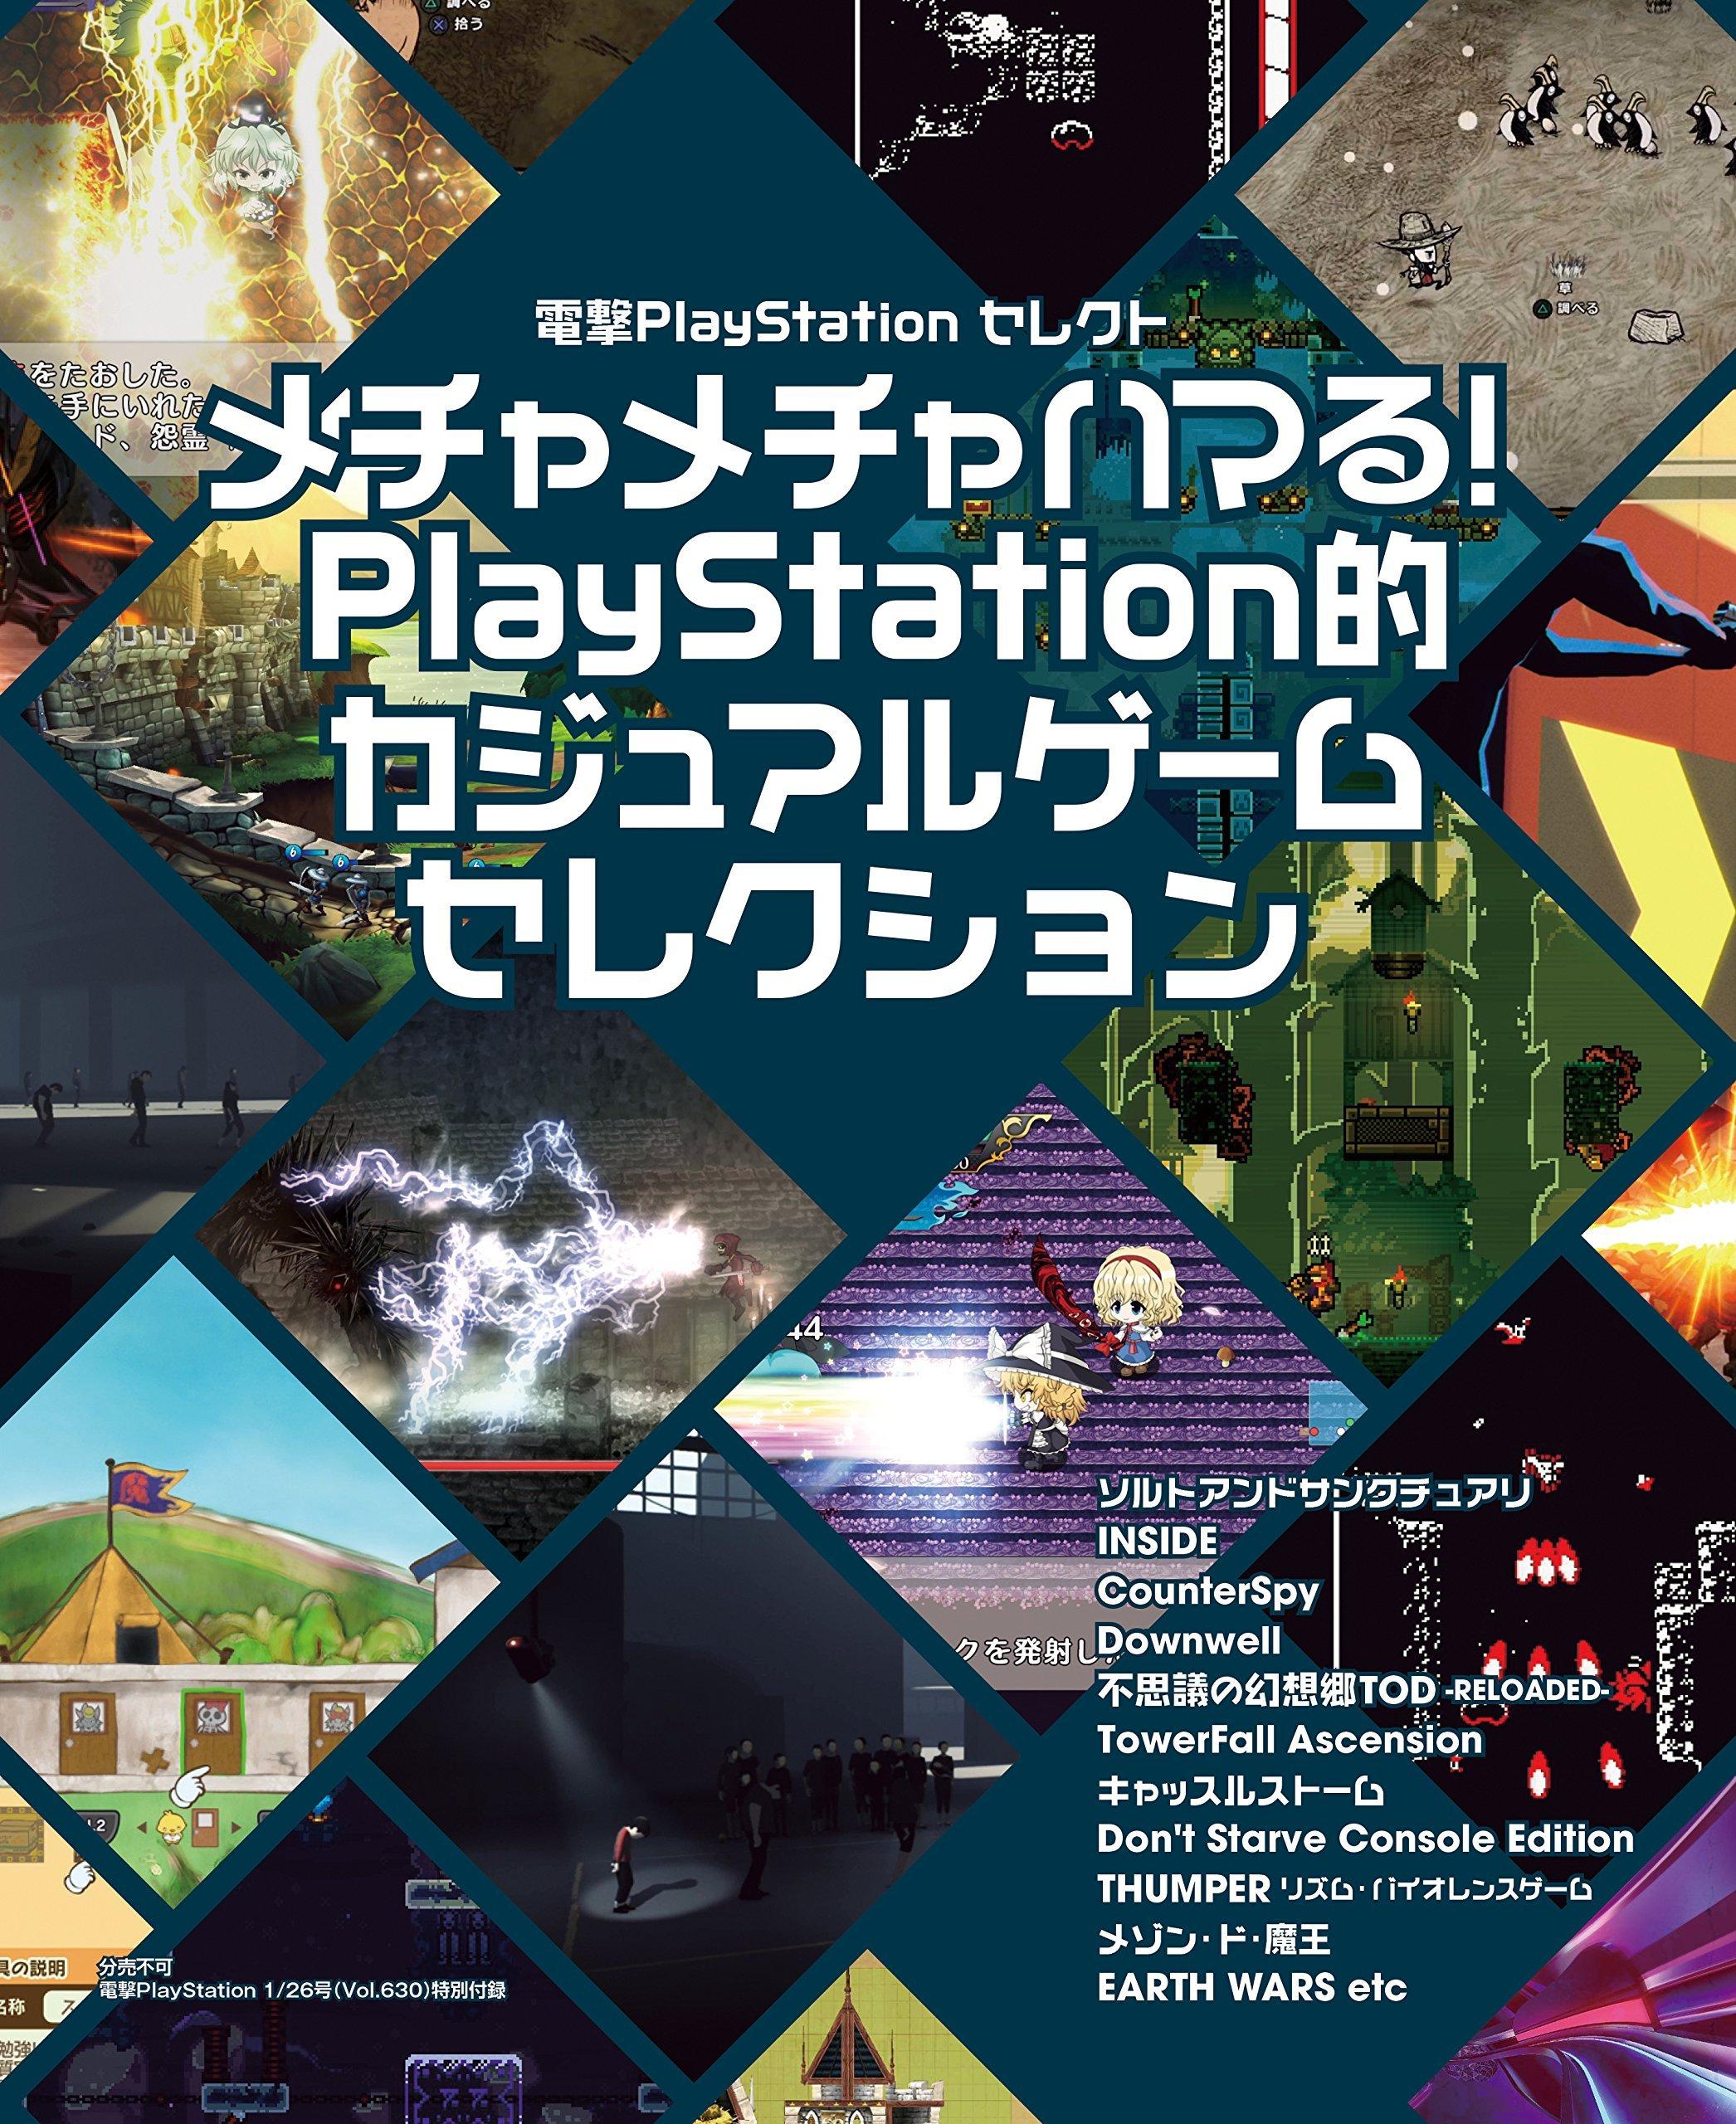 Dengeki PlayStation Select - Mechamecha Hamaru! PlayStation-teki Casual Game Selection (Vol.630 supplement) (January 26, 2017)